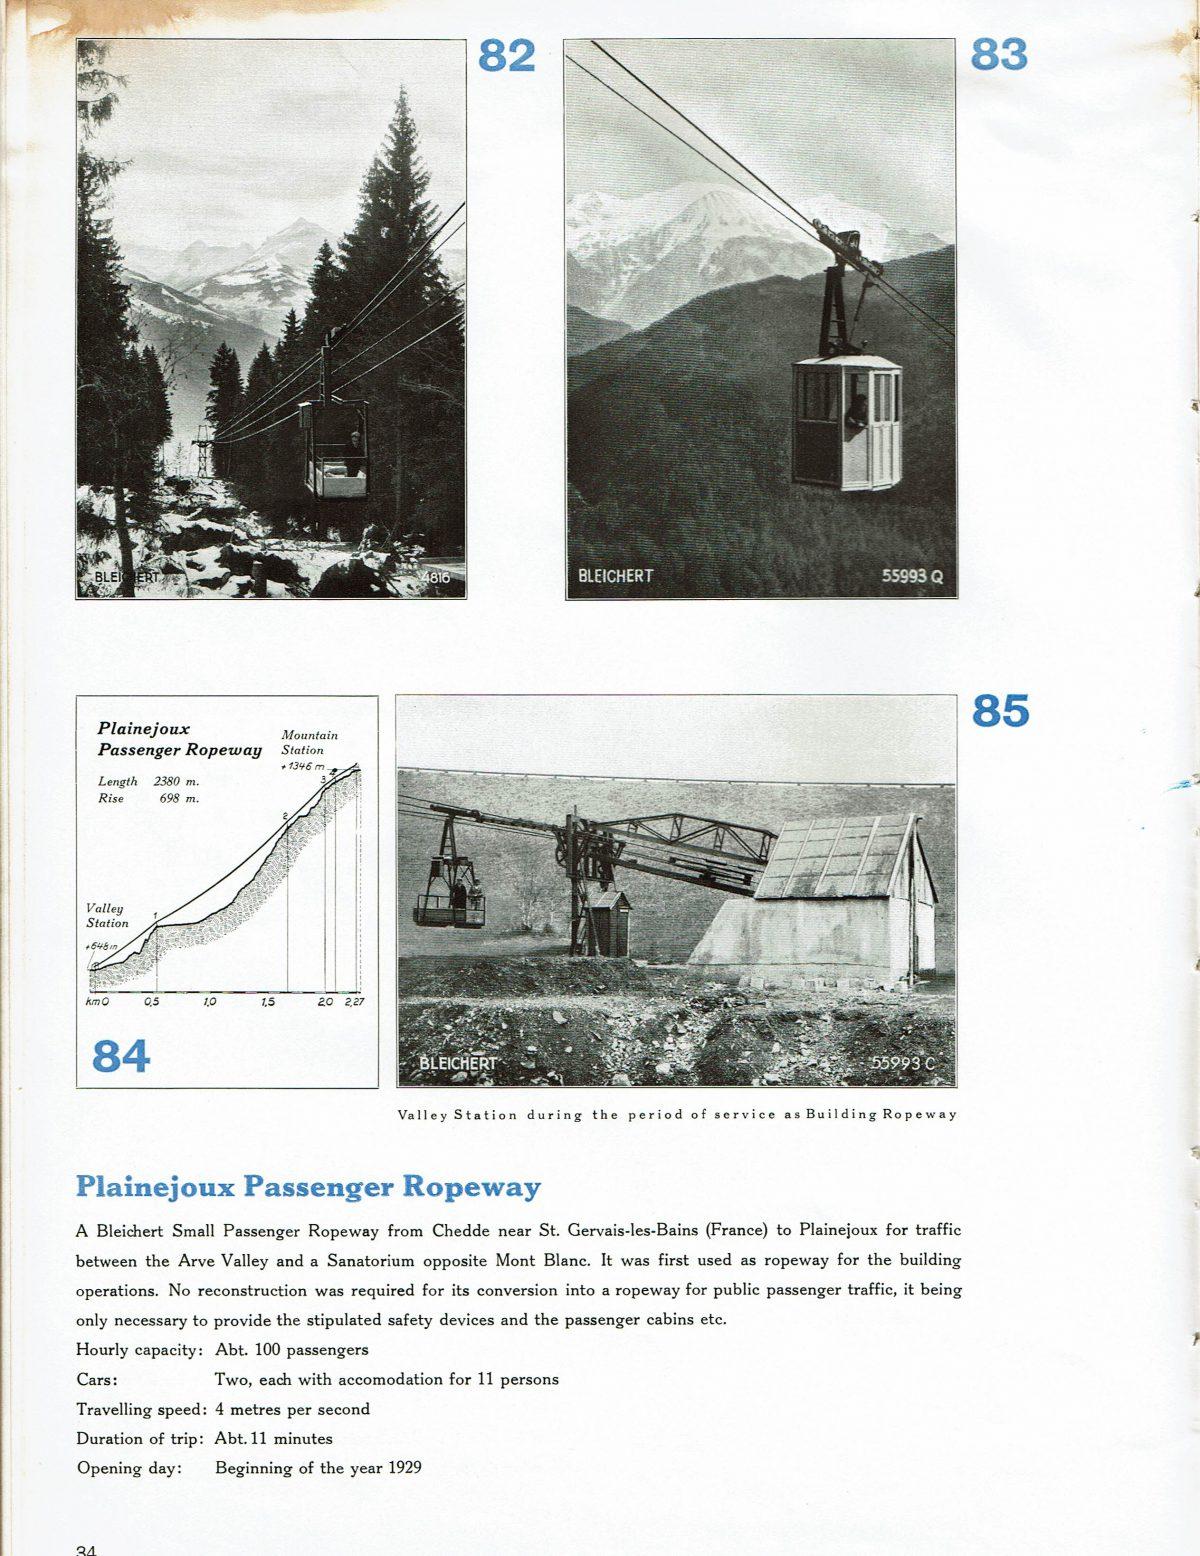 21_Bleichert Plainejoux (FRA) (82-83-84-85)